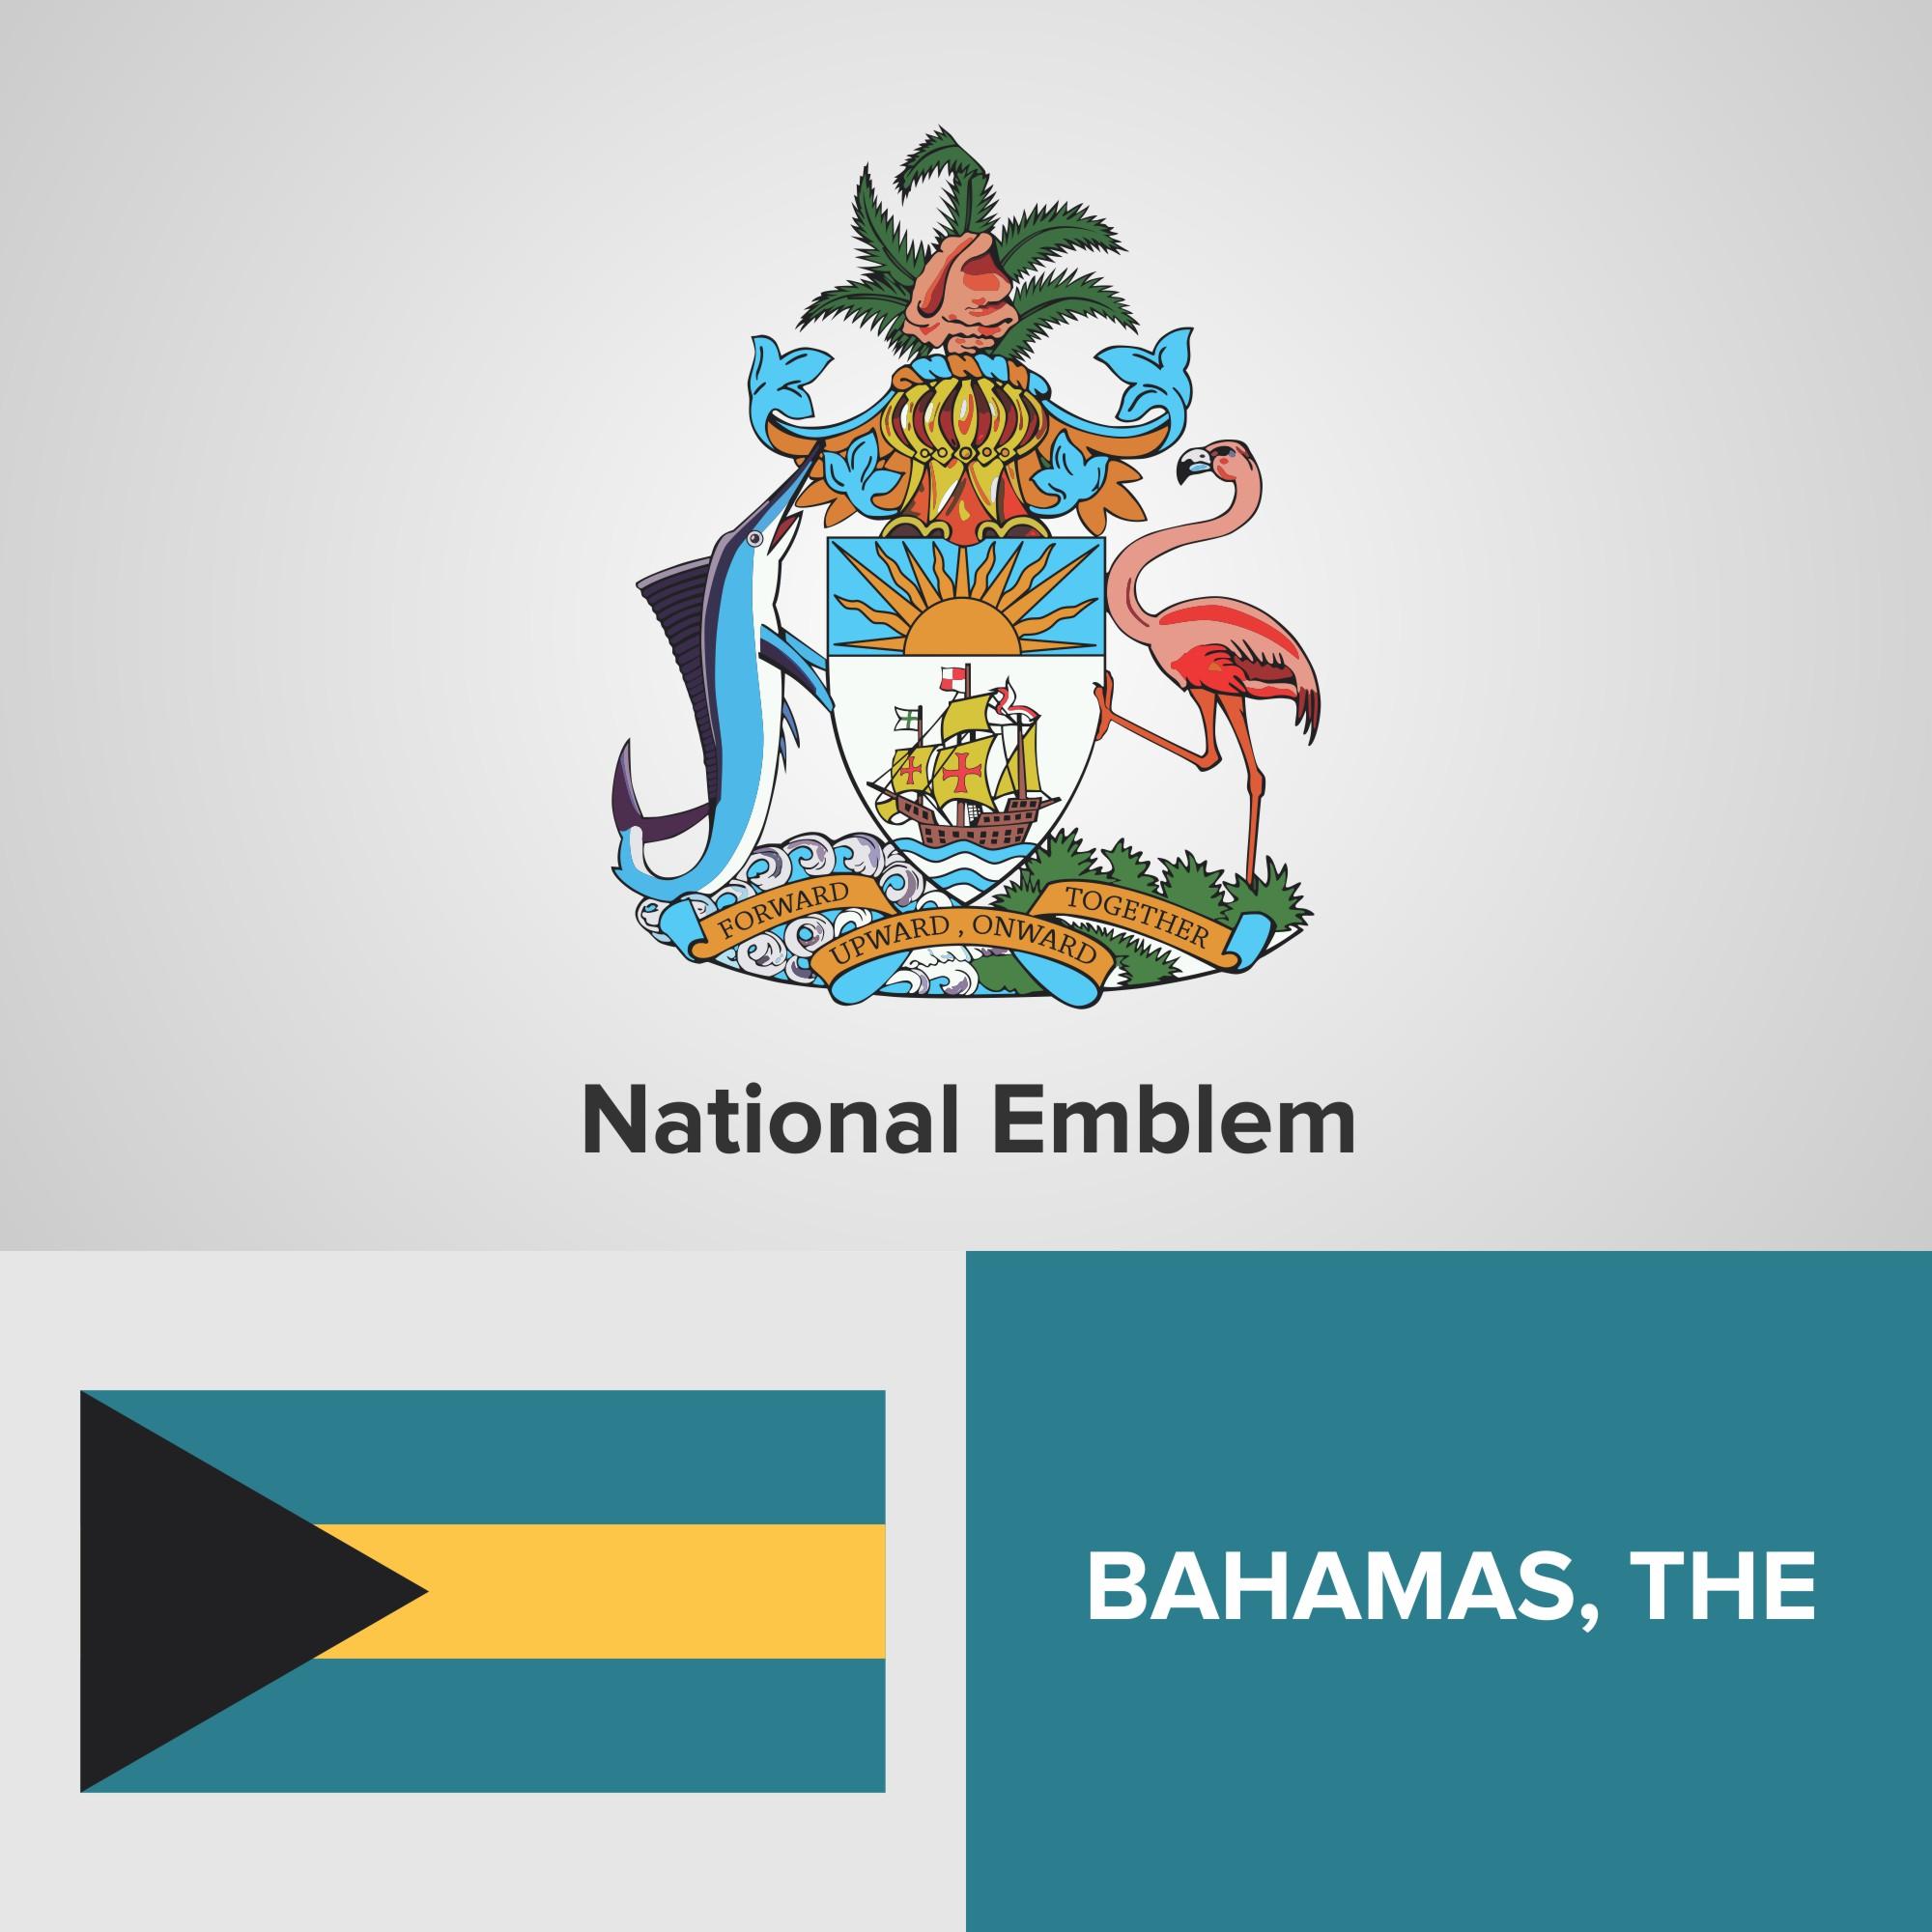 Bahamas National Emblem Map And Flag